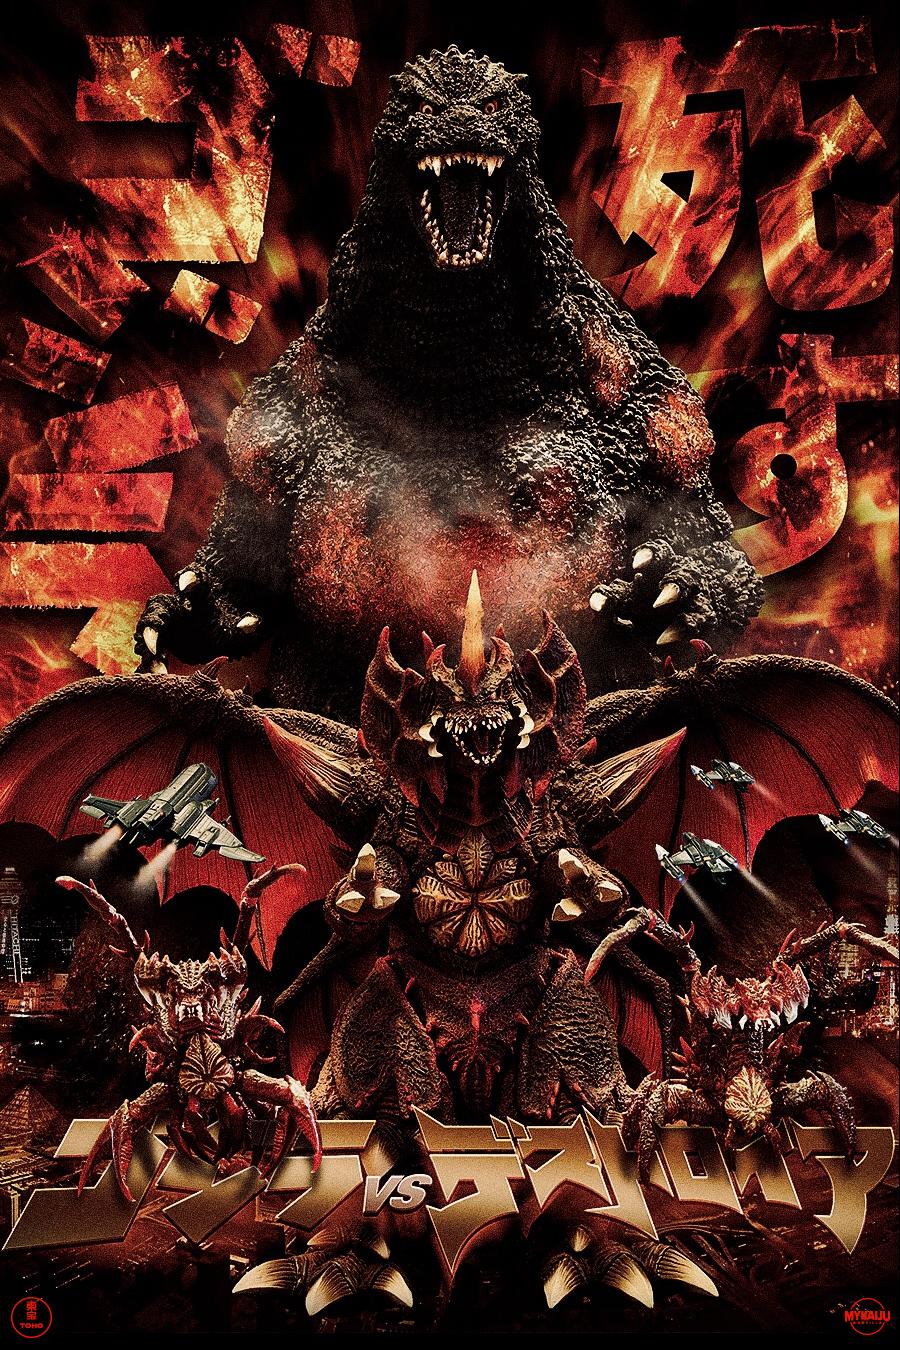 Godzilla vs Destroyah 1995